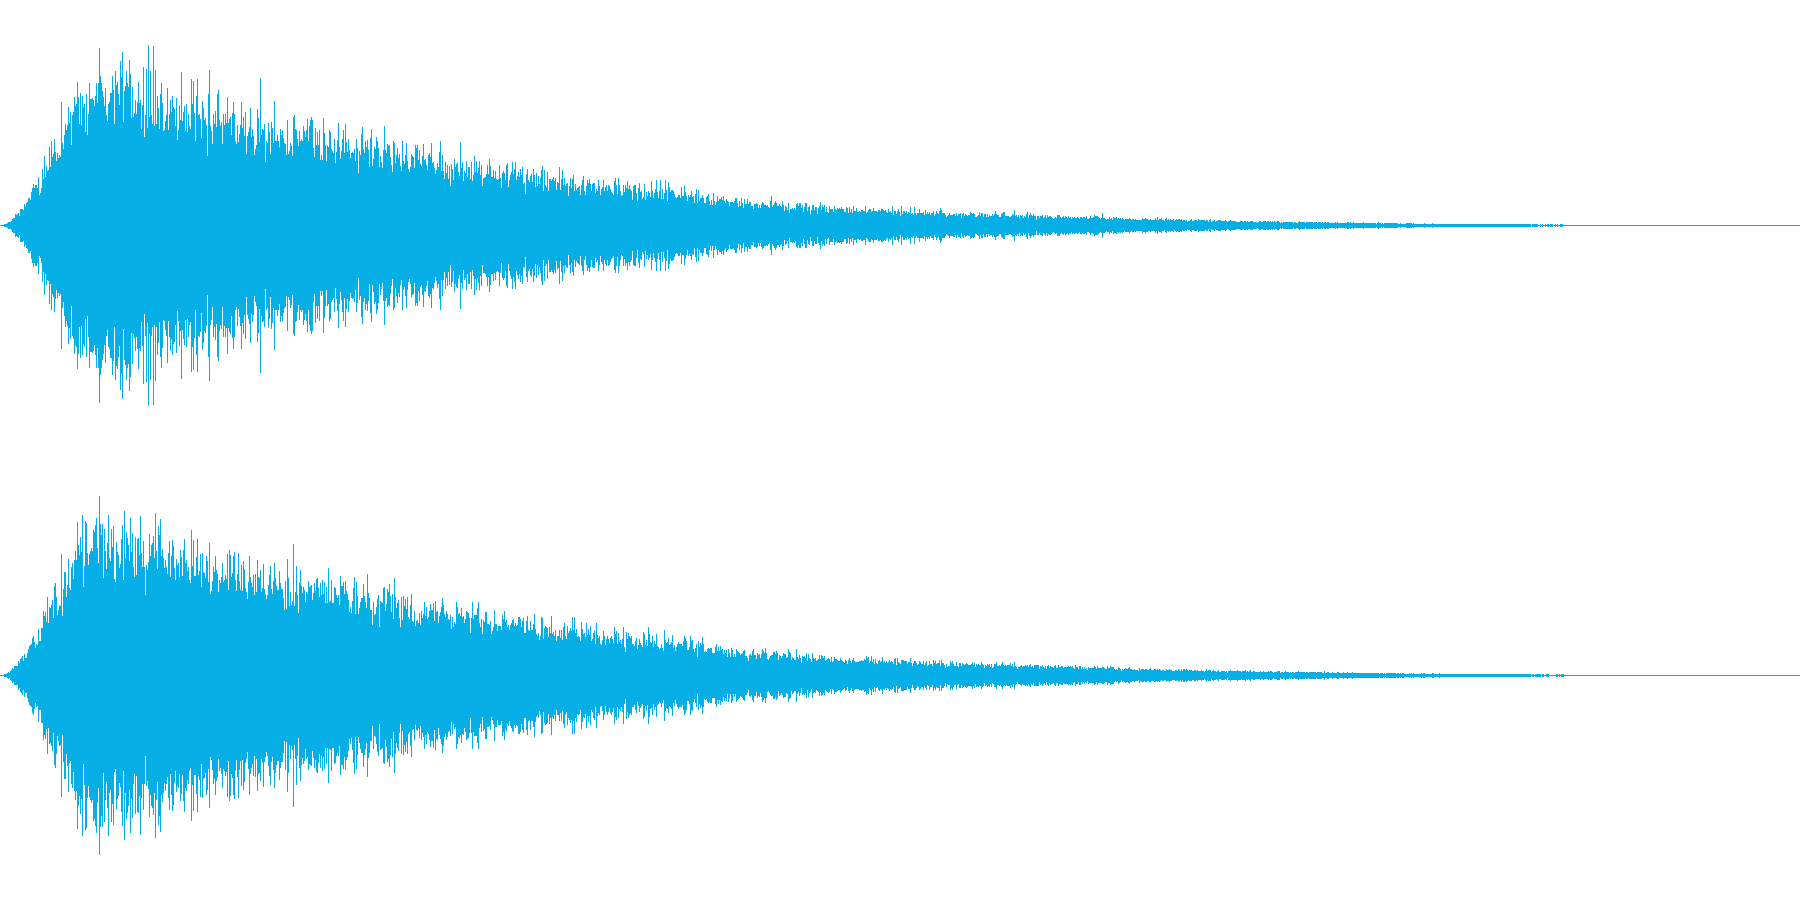 Seaside 波の音 ワンショット音源の再生済みの波形